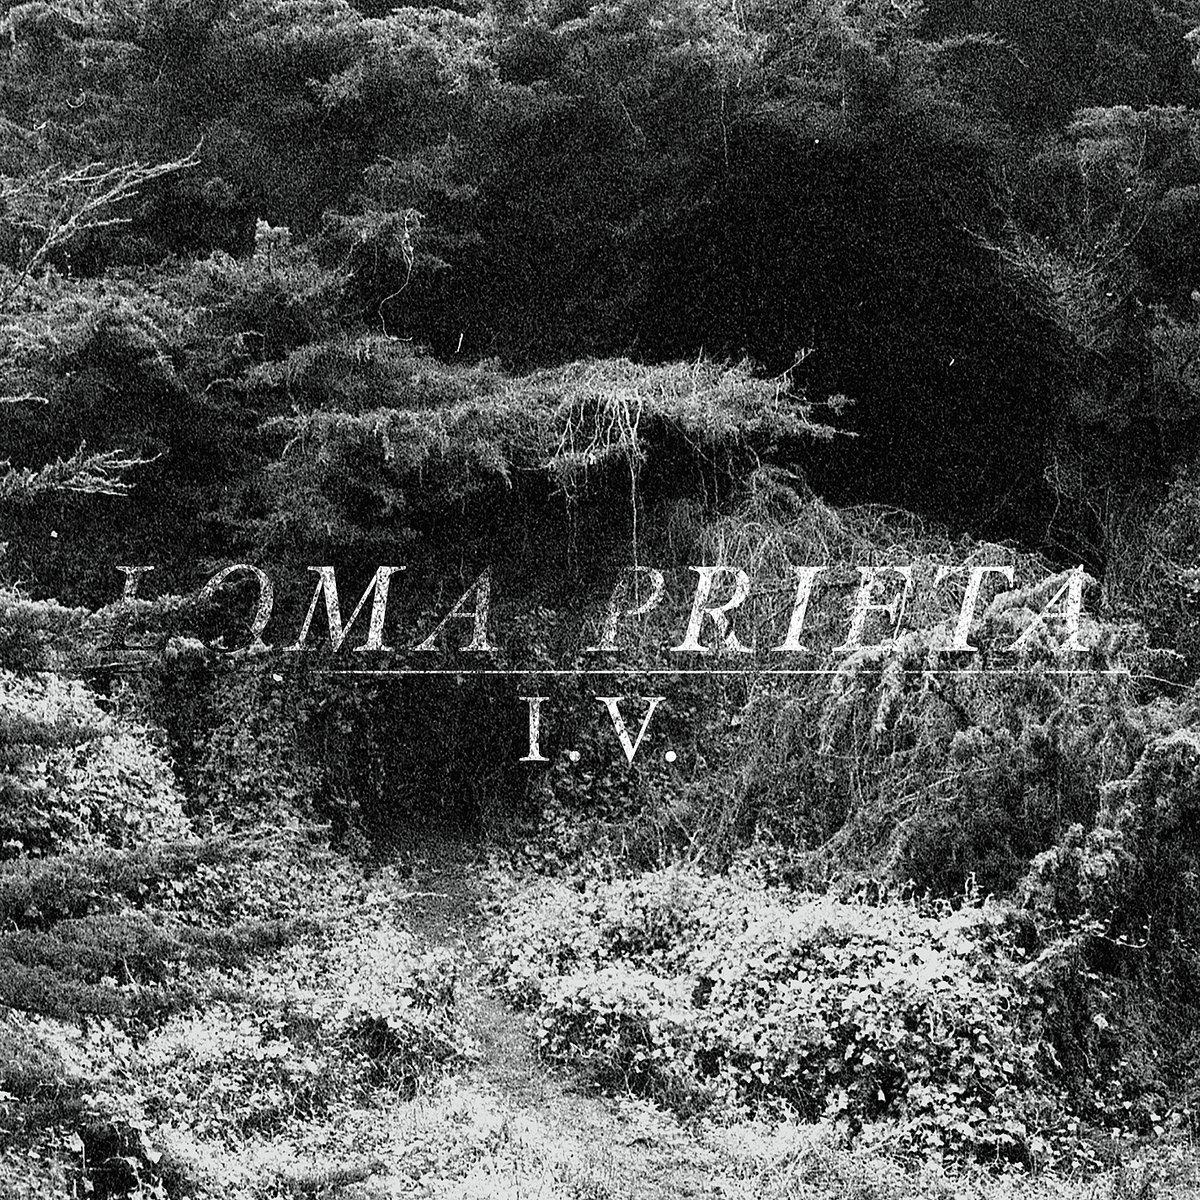 LOMA PRIETA I.V. – Vinyl LP (black)